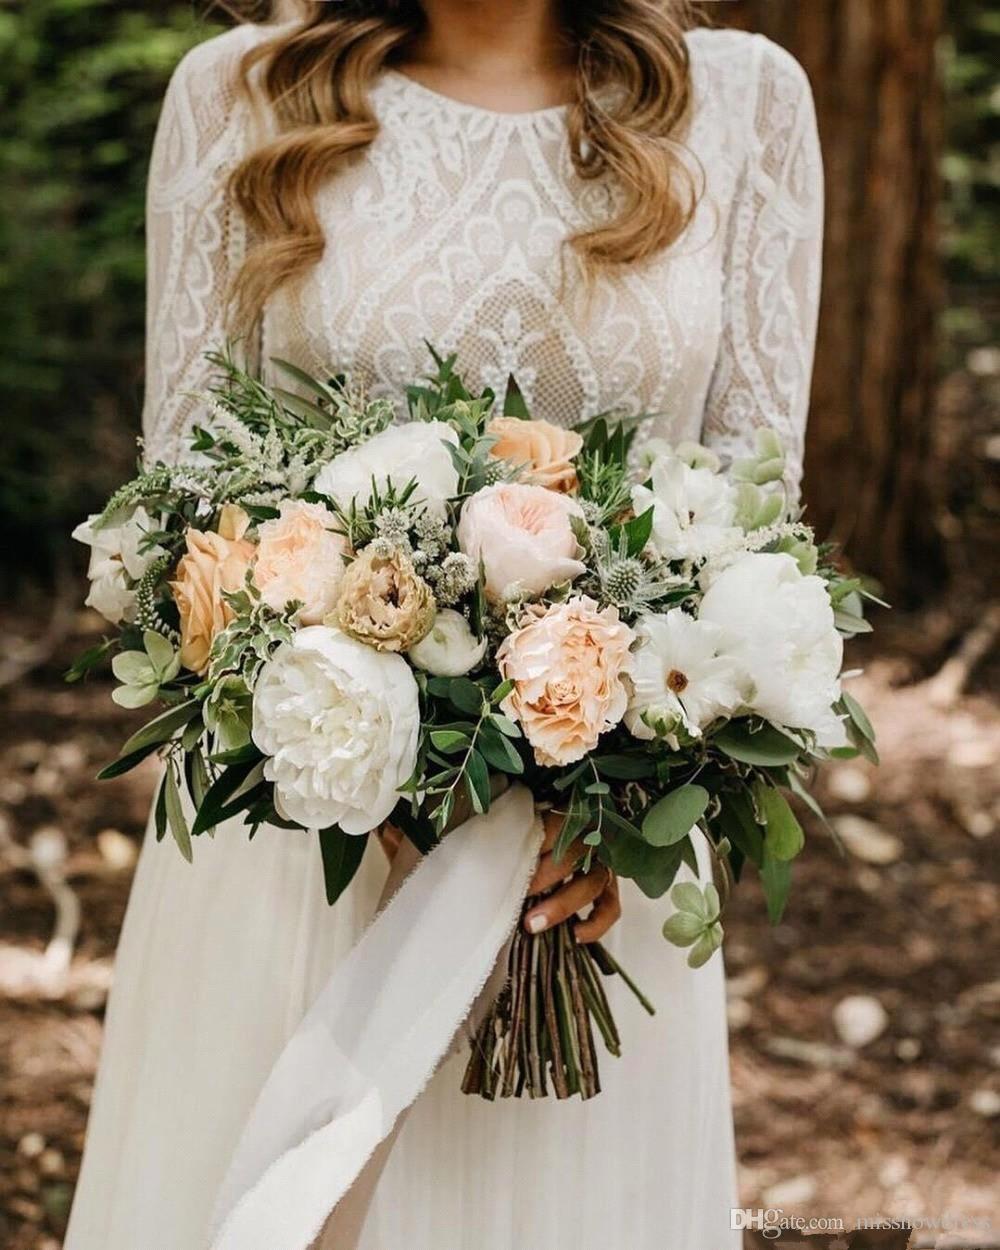 https://www.dhresource.com/0x0s/f2-albu-g10-M00-54-7F-rBVaWV0LXiGABeRQAAQUfTLg6Wg767.jpg/beach-bohemian-wedding-dresses-sexy-backless.jpg